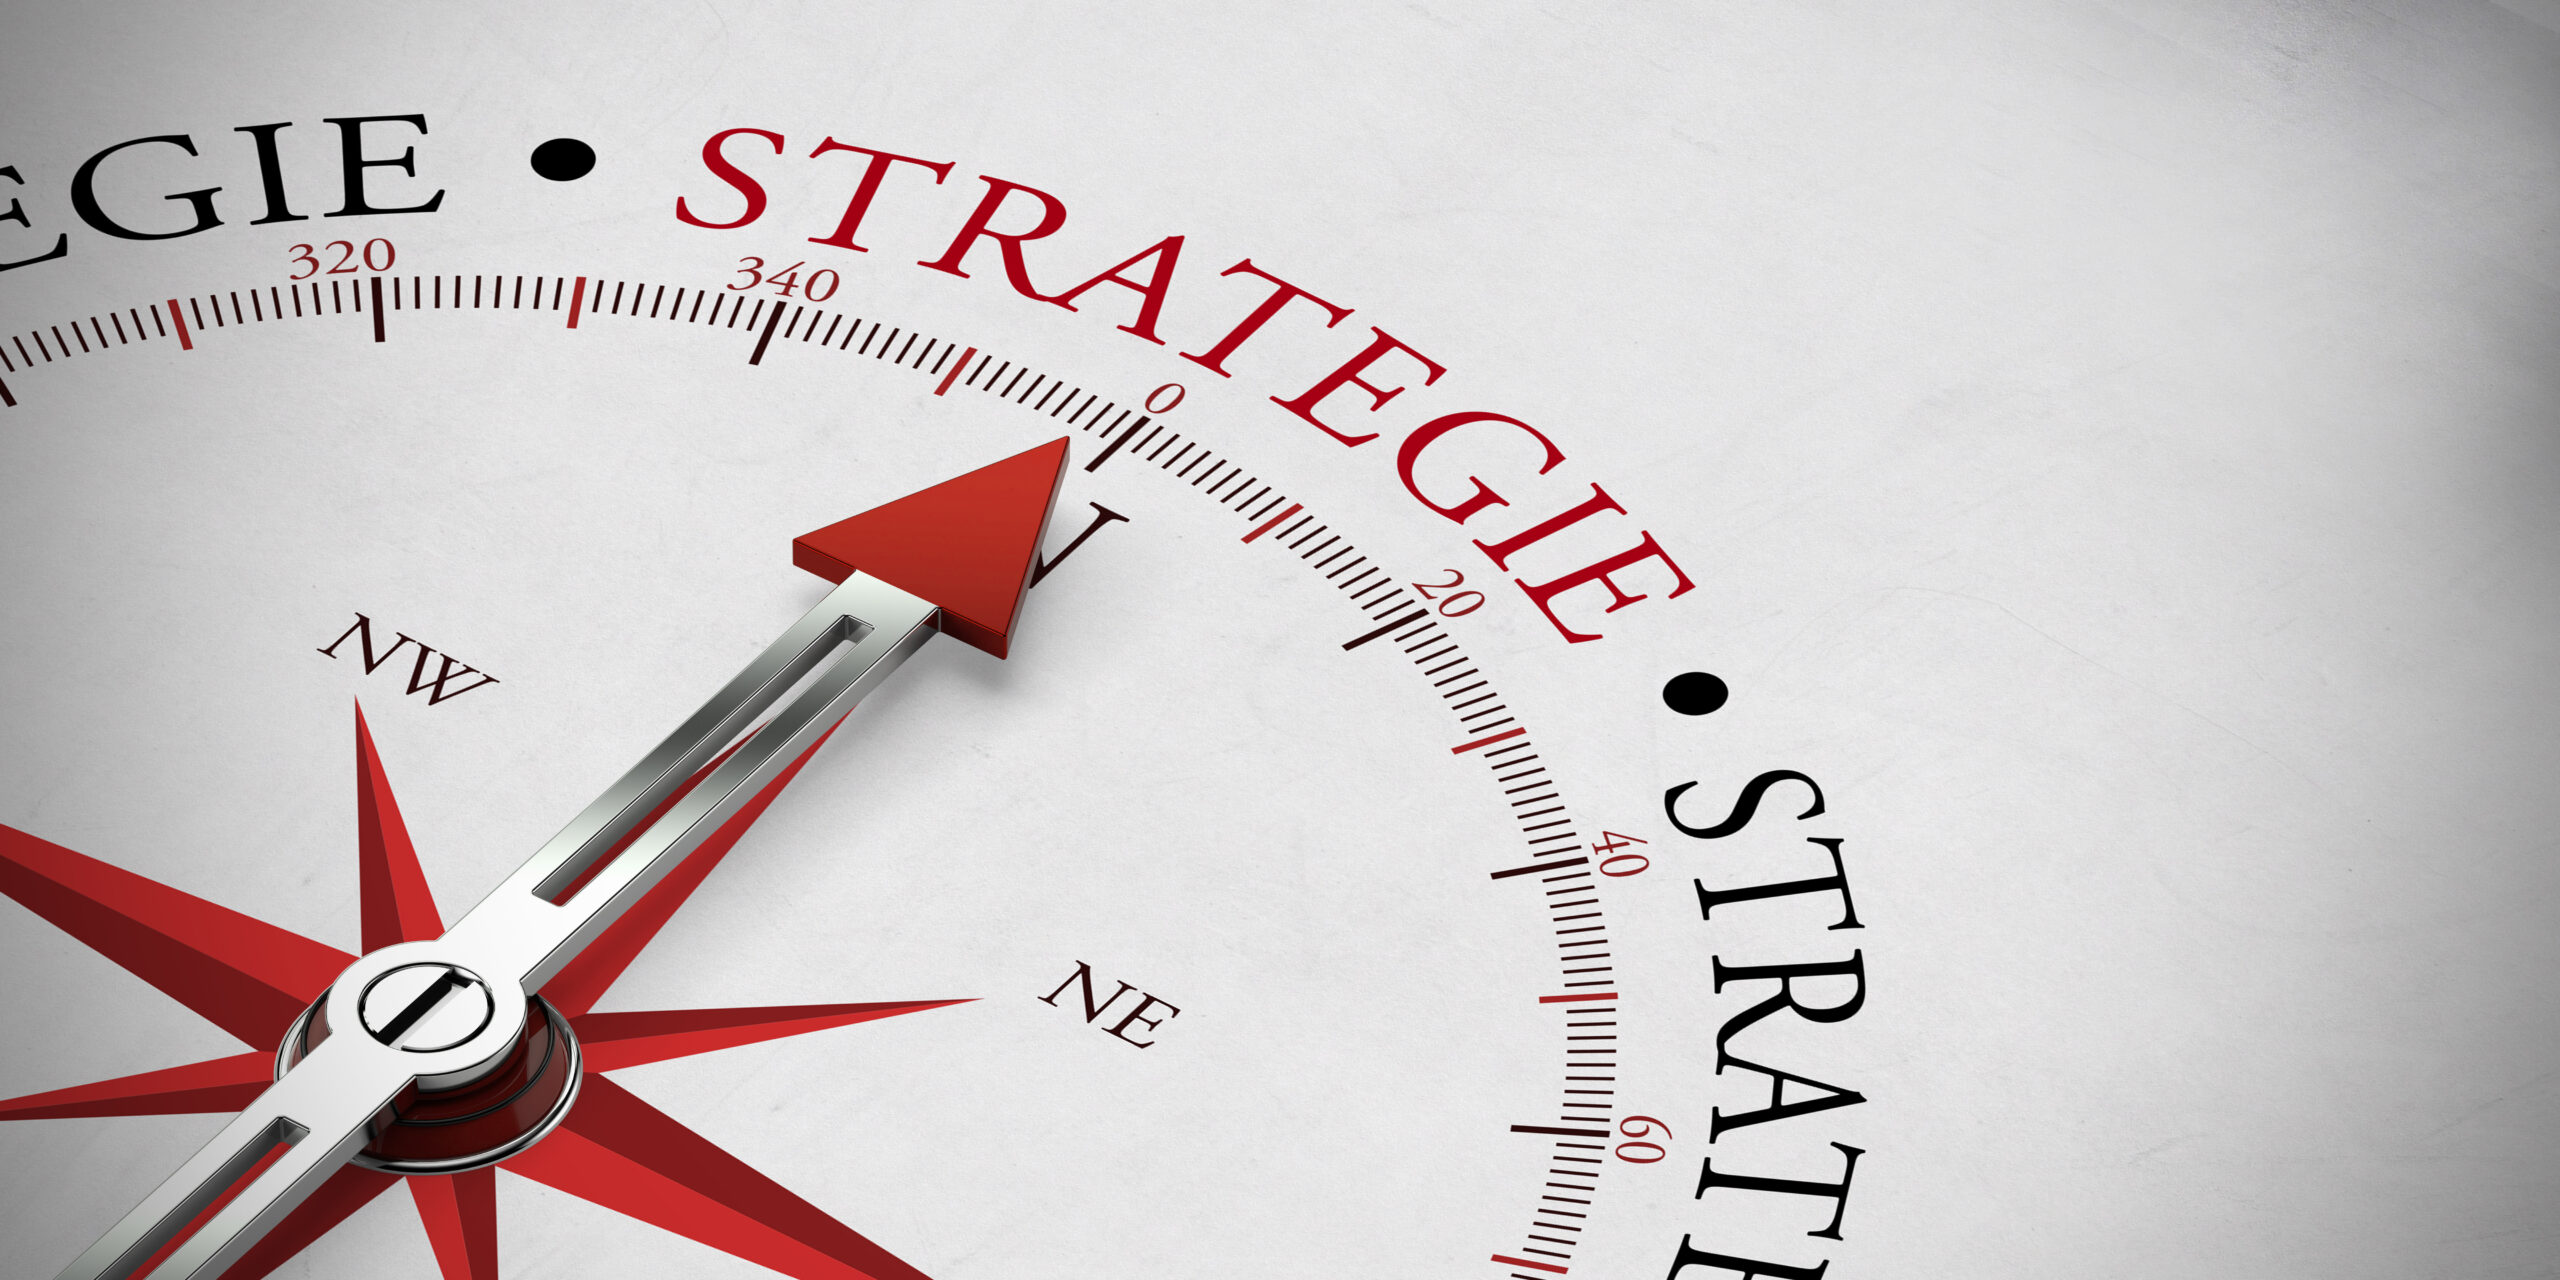 Kompassnadel mit Strategie